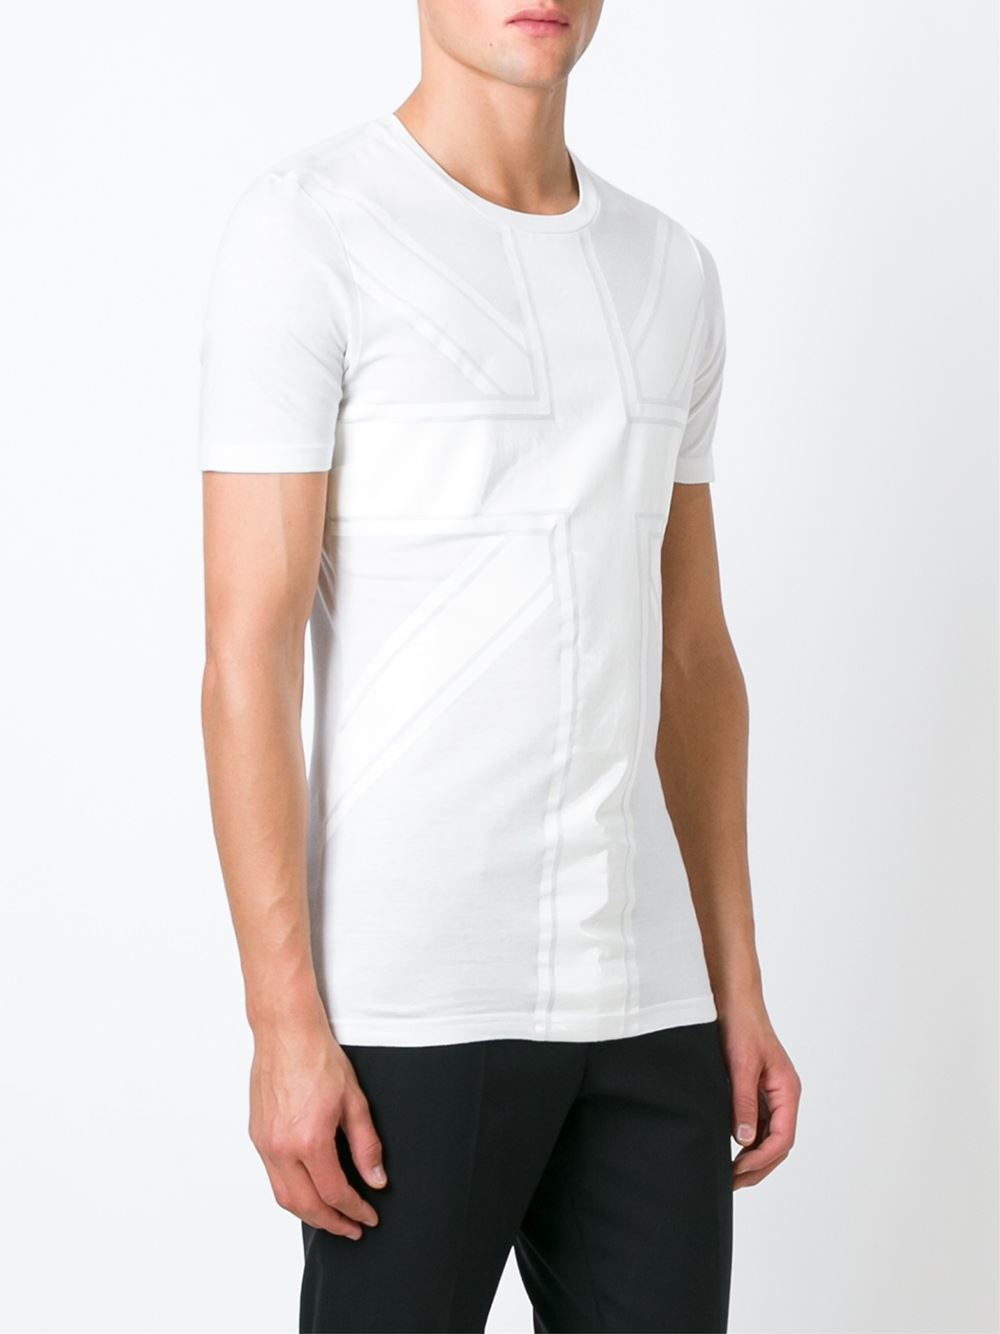 helmut lang union jack print t shirt in white for men lyst. Black Bedroom Furniture Sets. Home Design Ideas